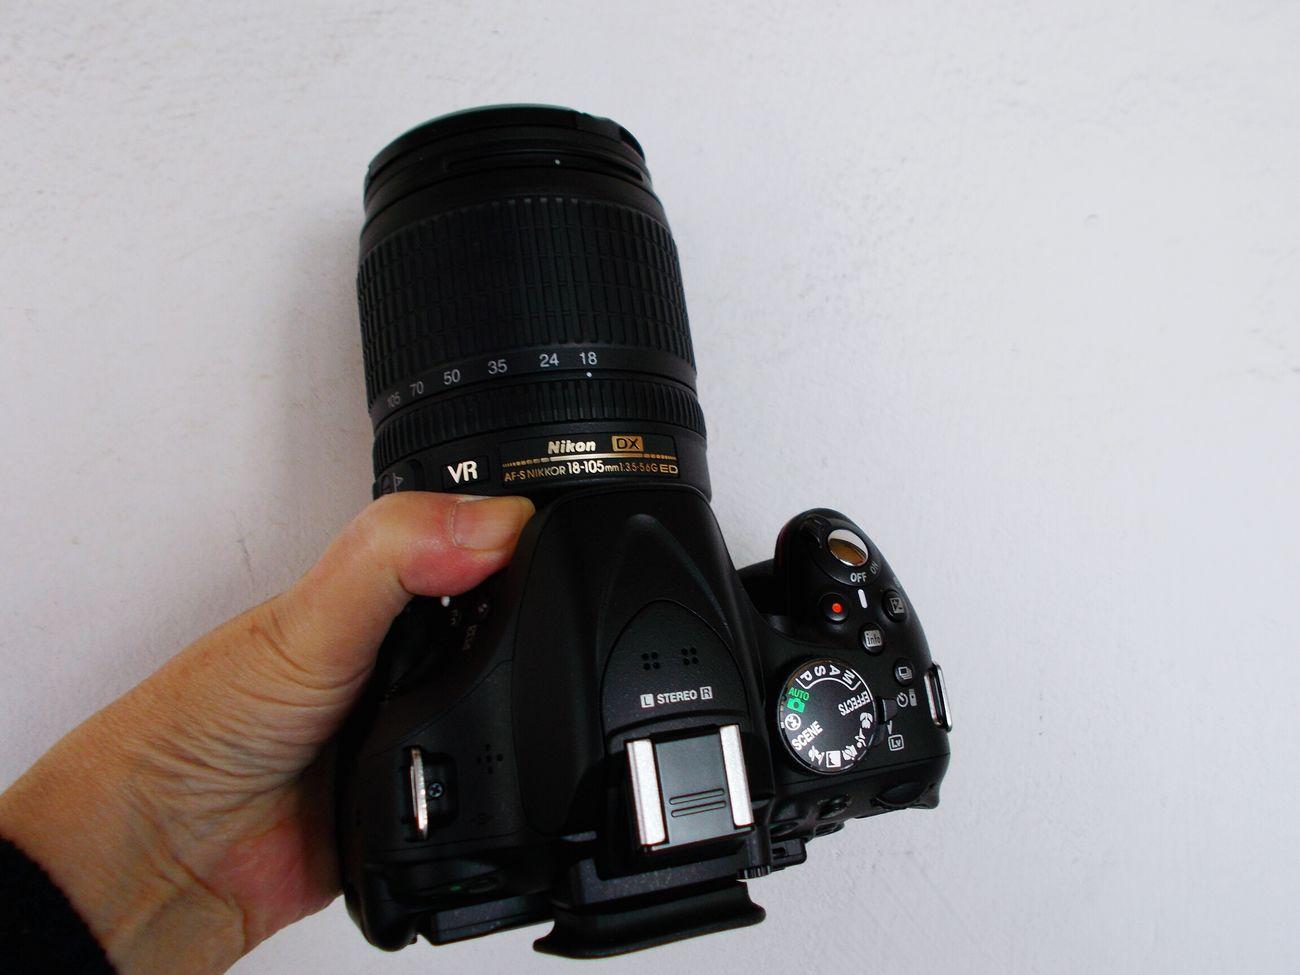 New Entry Nikon D5200, 18-105 mm, my first DSLR camera...HEEEELLLPP!!!!!!!!! AIUUUUTOOO!!!!!!!! EyeEm Team Adventure! and now...blood, sweat & tears...😵📷😲😲😱😜😁